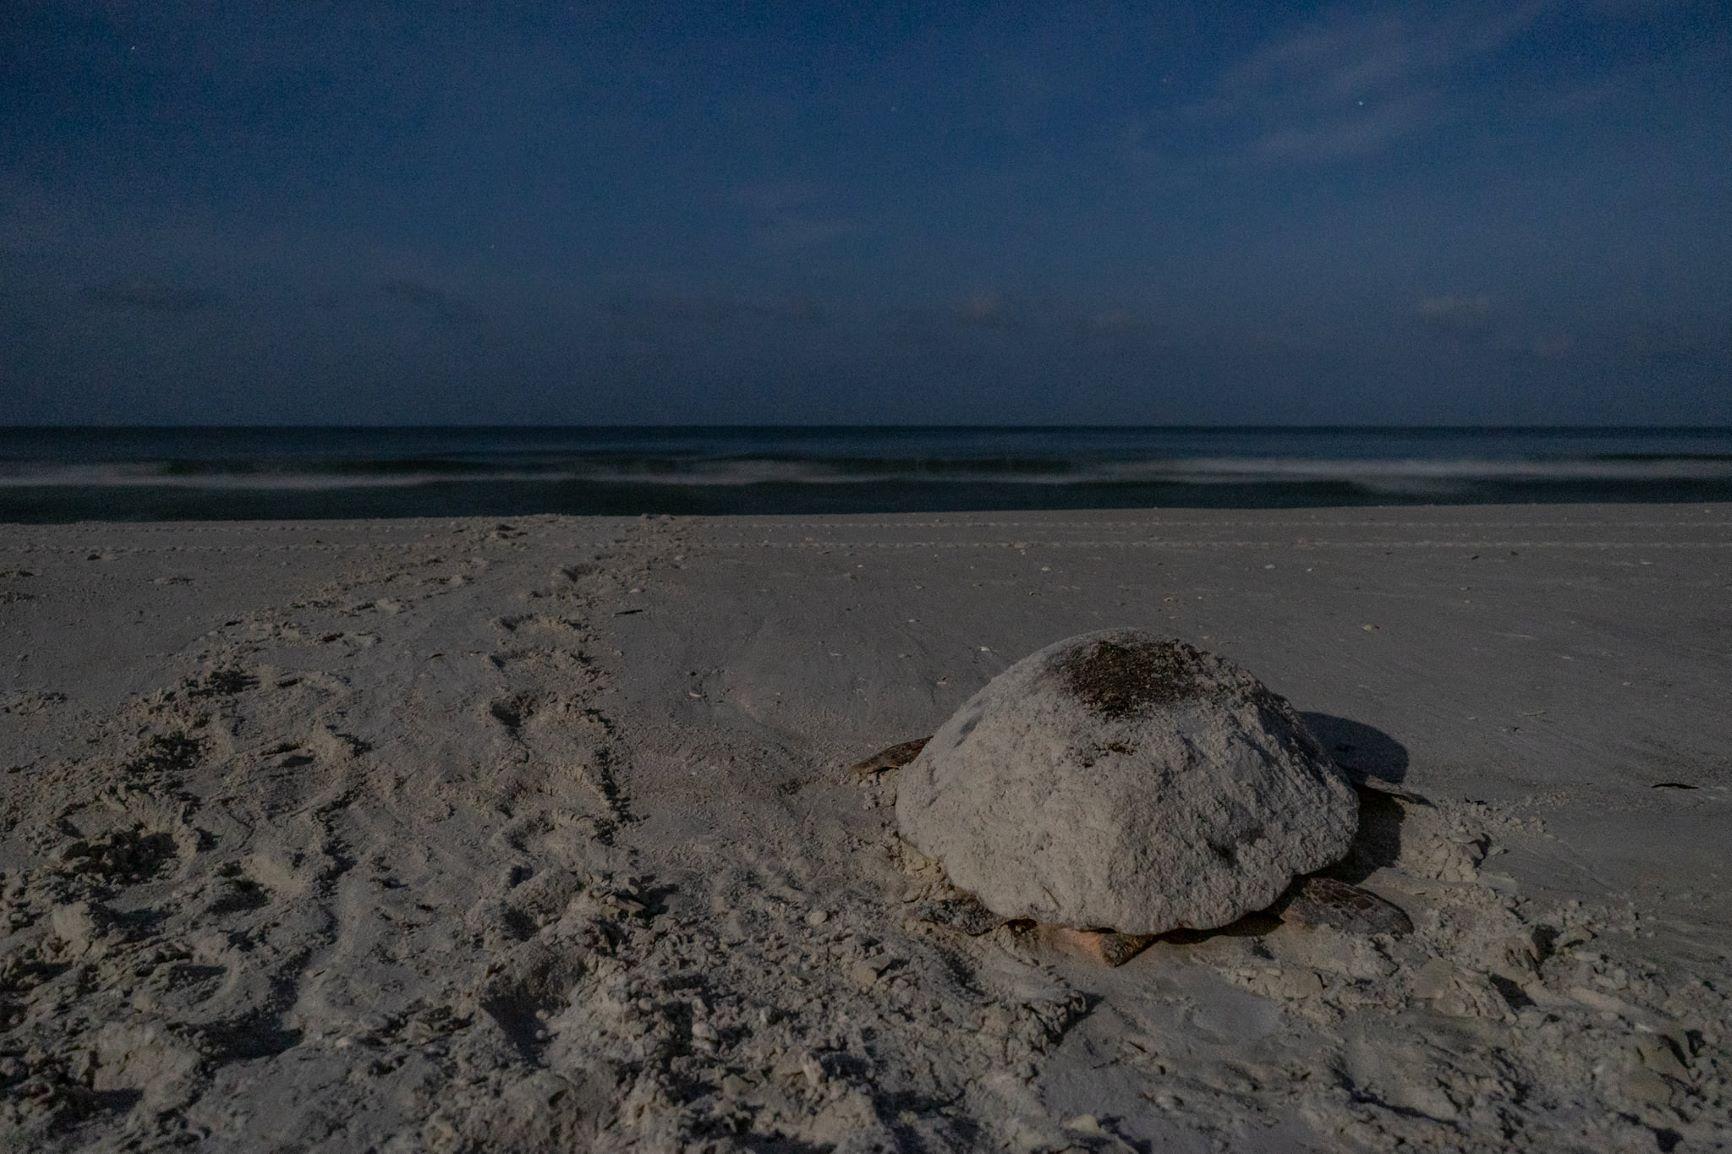 Nesting female loggerhead sea turtle returning to the Gulf of Mexico